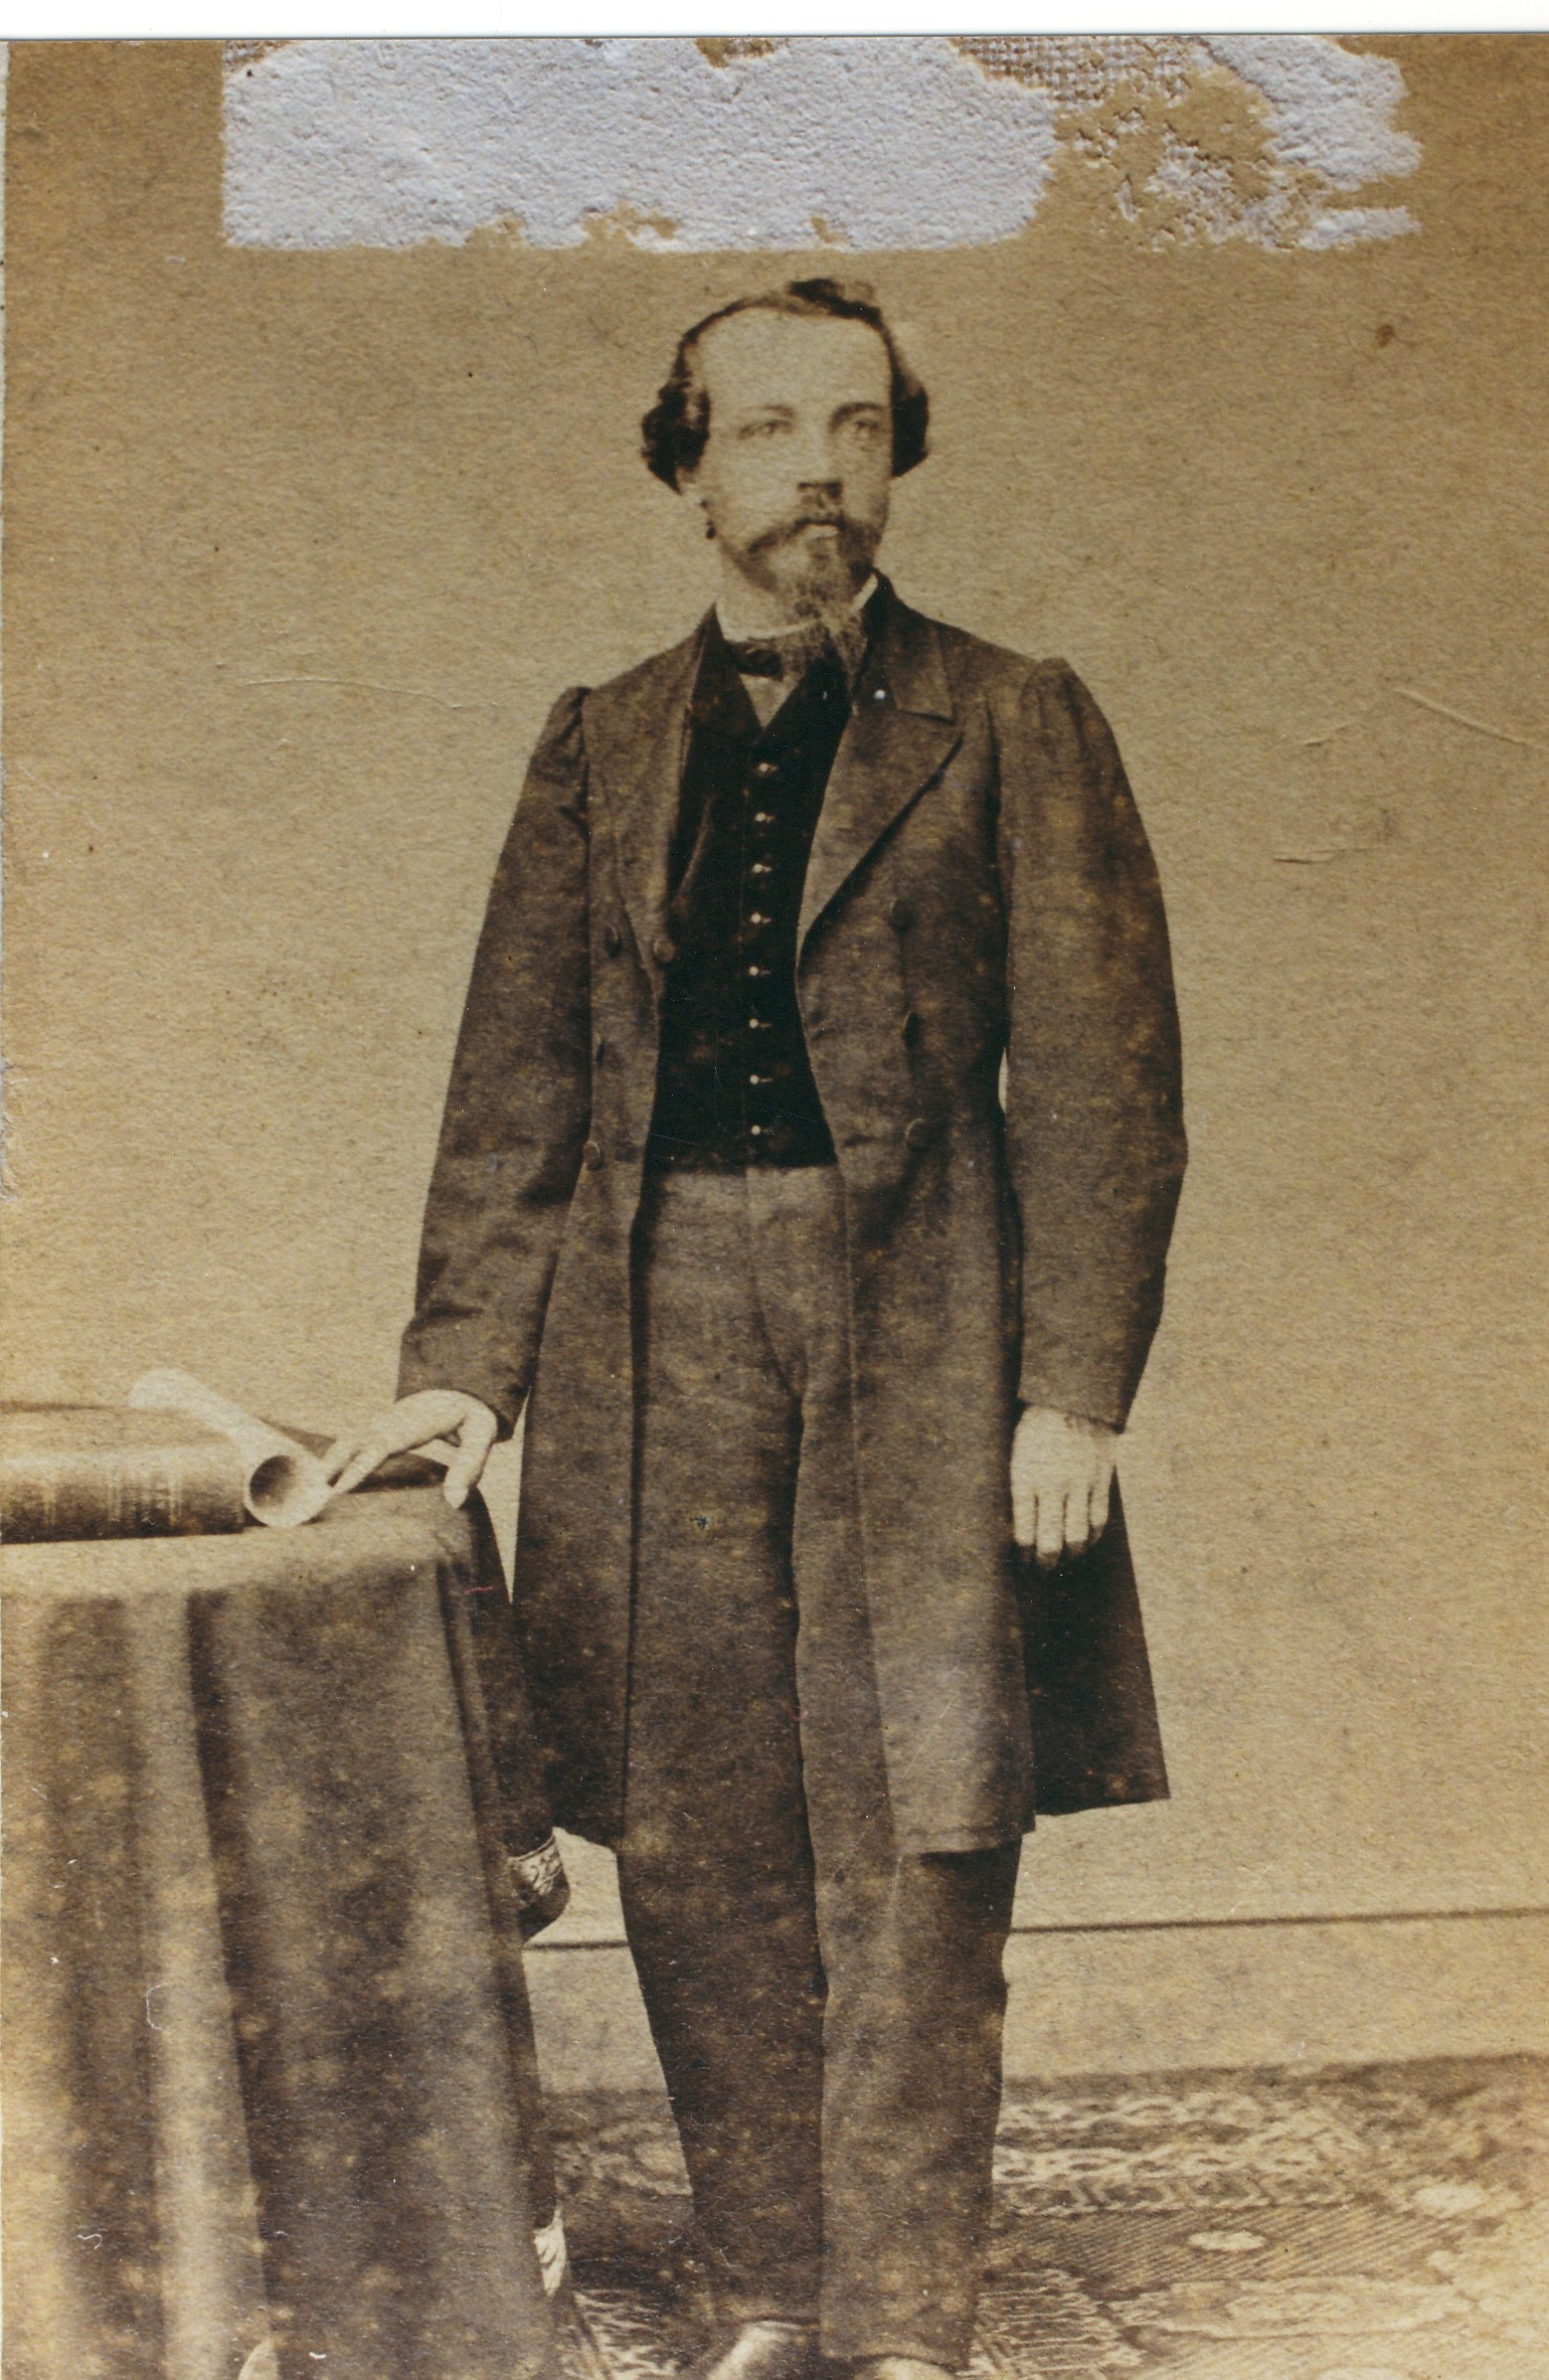 Bertonneau 01 Arnold Bertonneau circa 1880